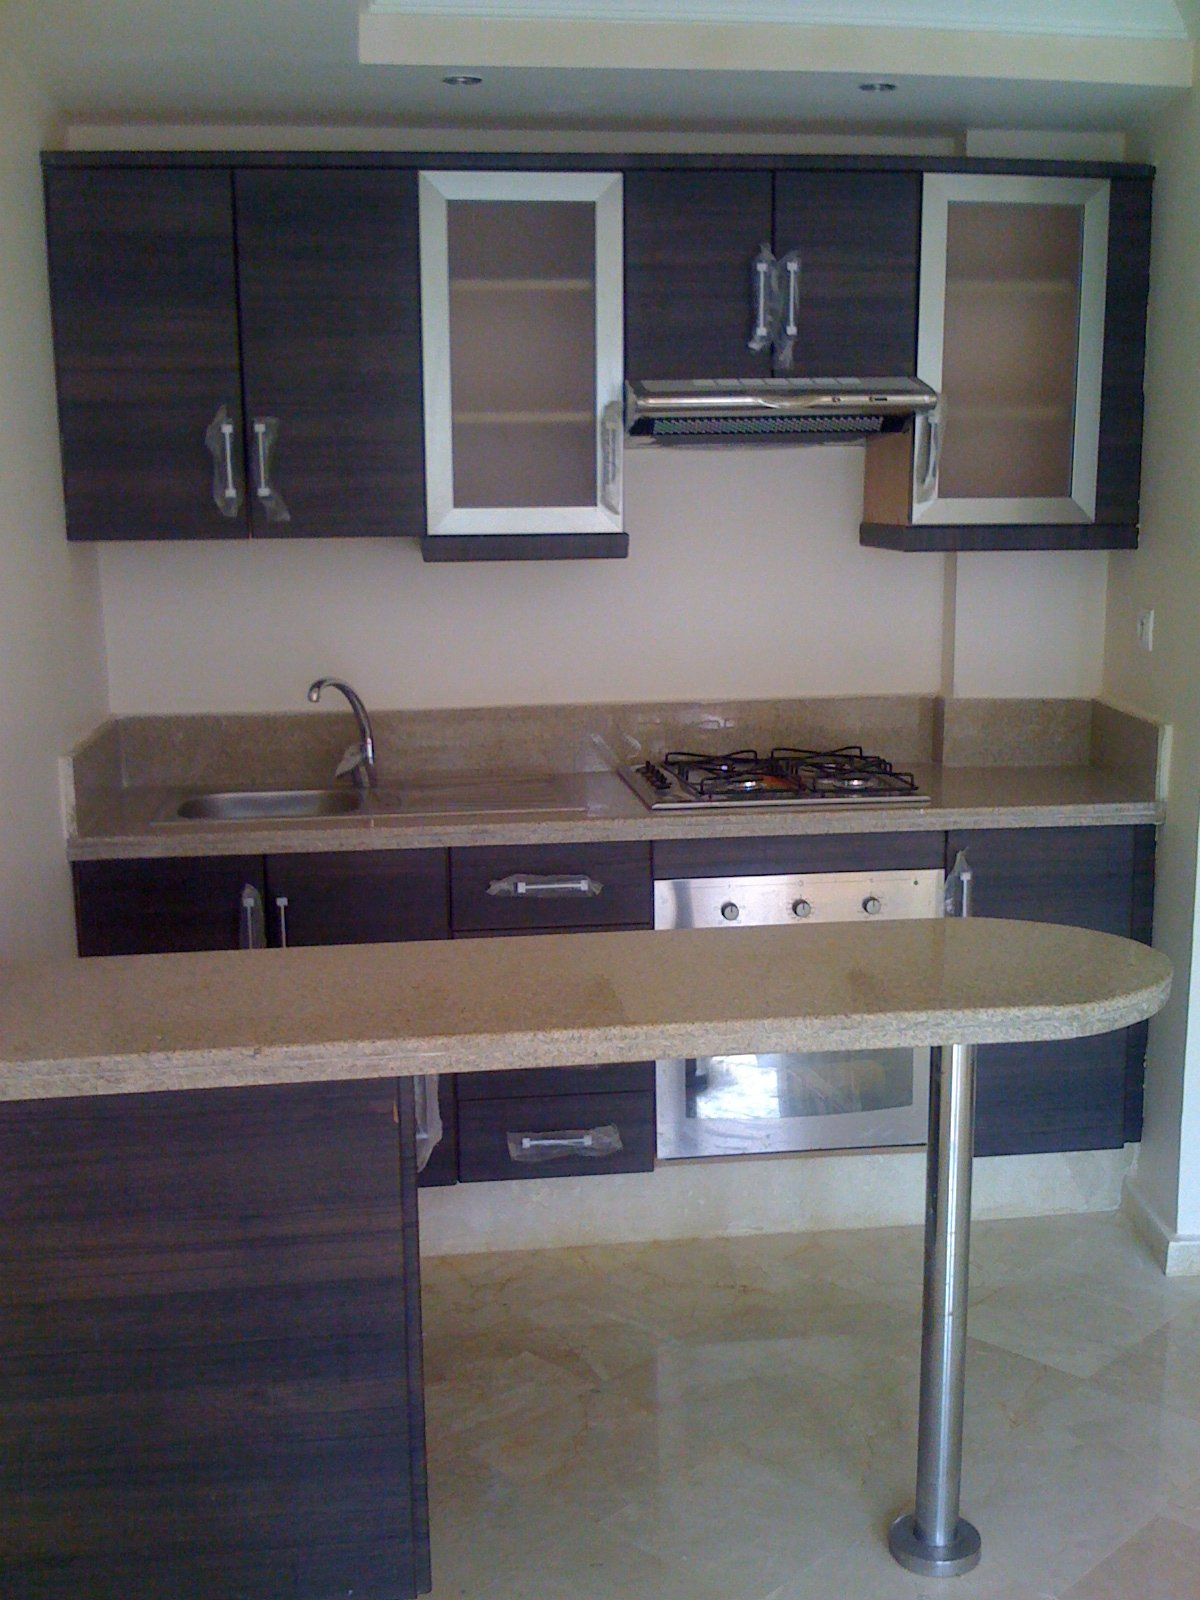 professionel espagnol fabricant de cuisine pour equiper. Black Bedroom Furniture Sets. Home Design Ideas